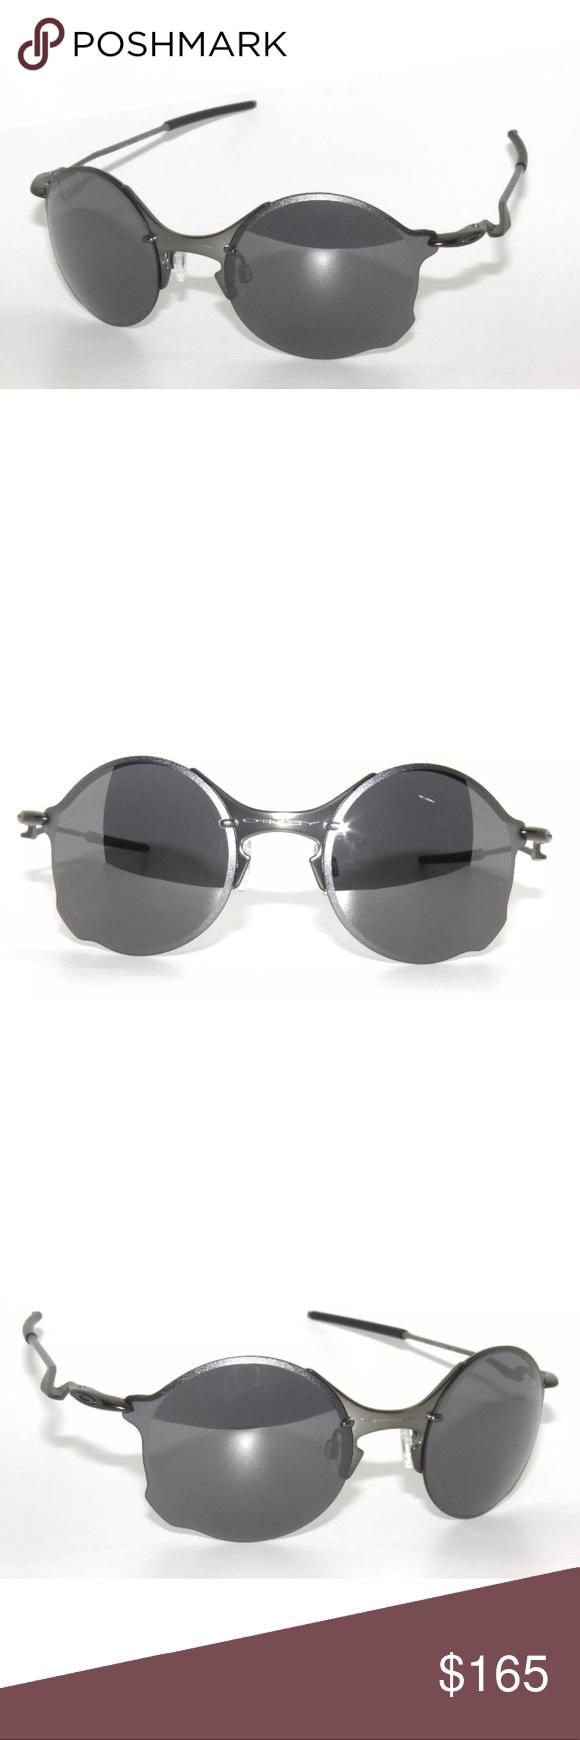 783d58fcb Brand new Oakley Tailend 4088-01 Sunglasses Brand new, comes with all  accessories Oakley Accessories Sunglasses